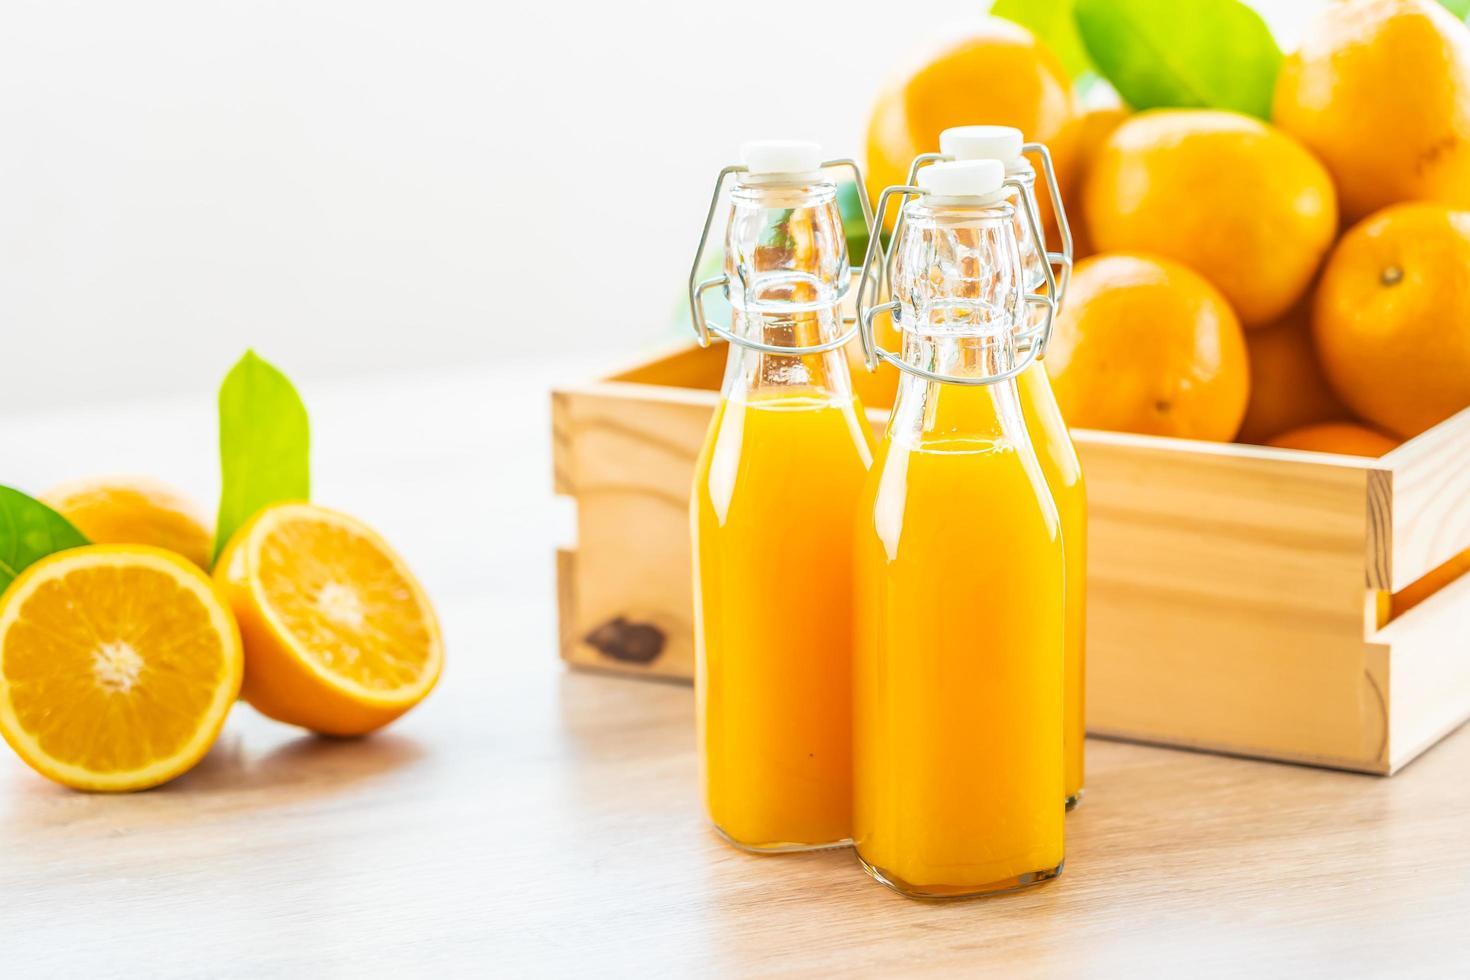 vers sinaasappelsap en sinaasappels foto